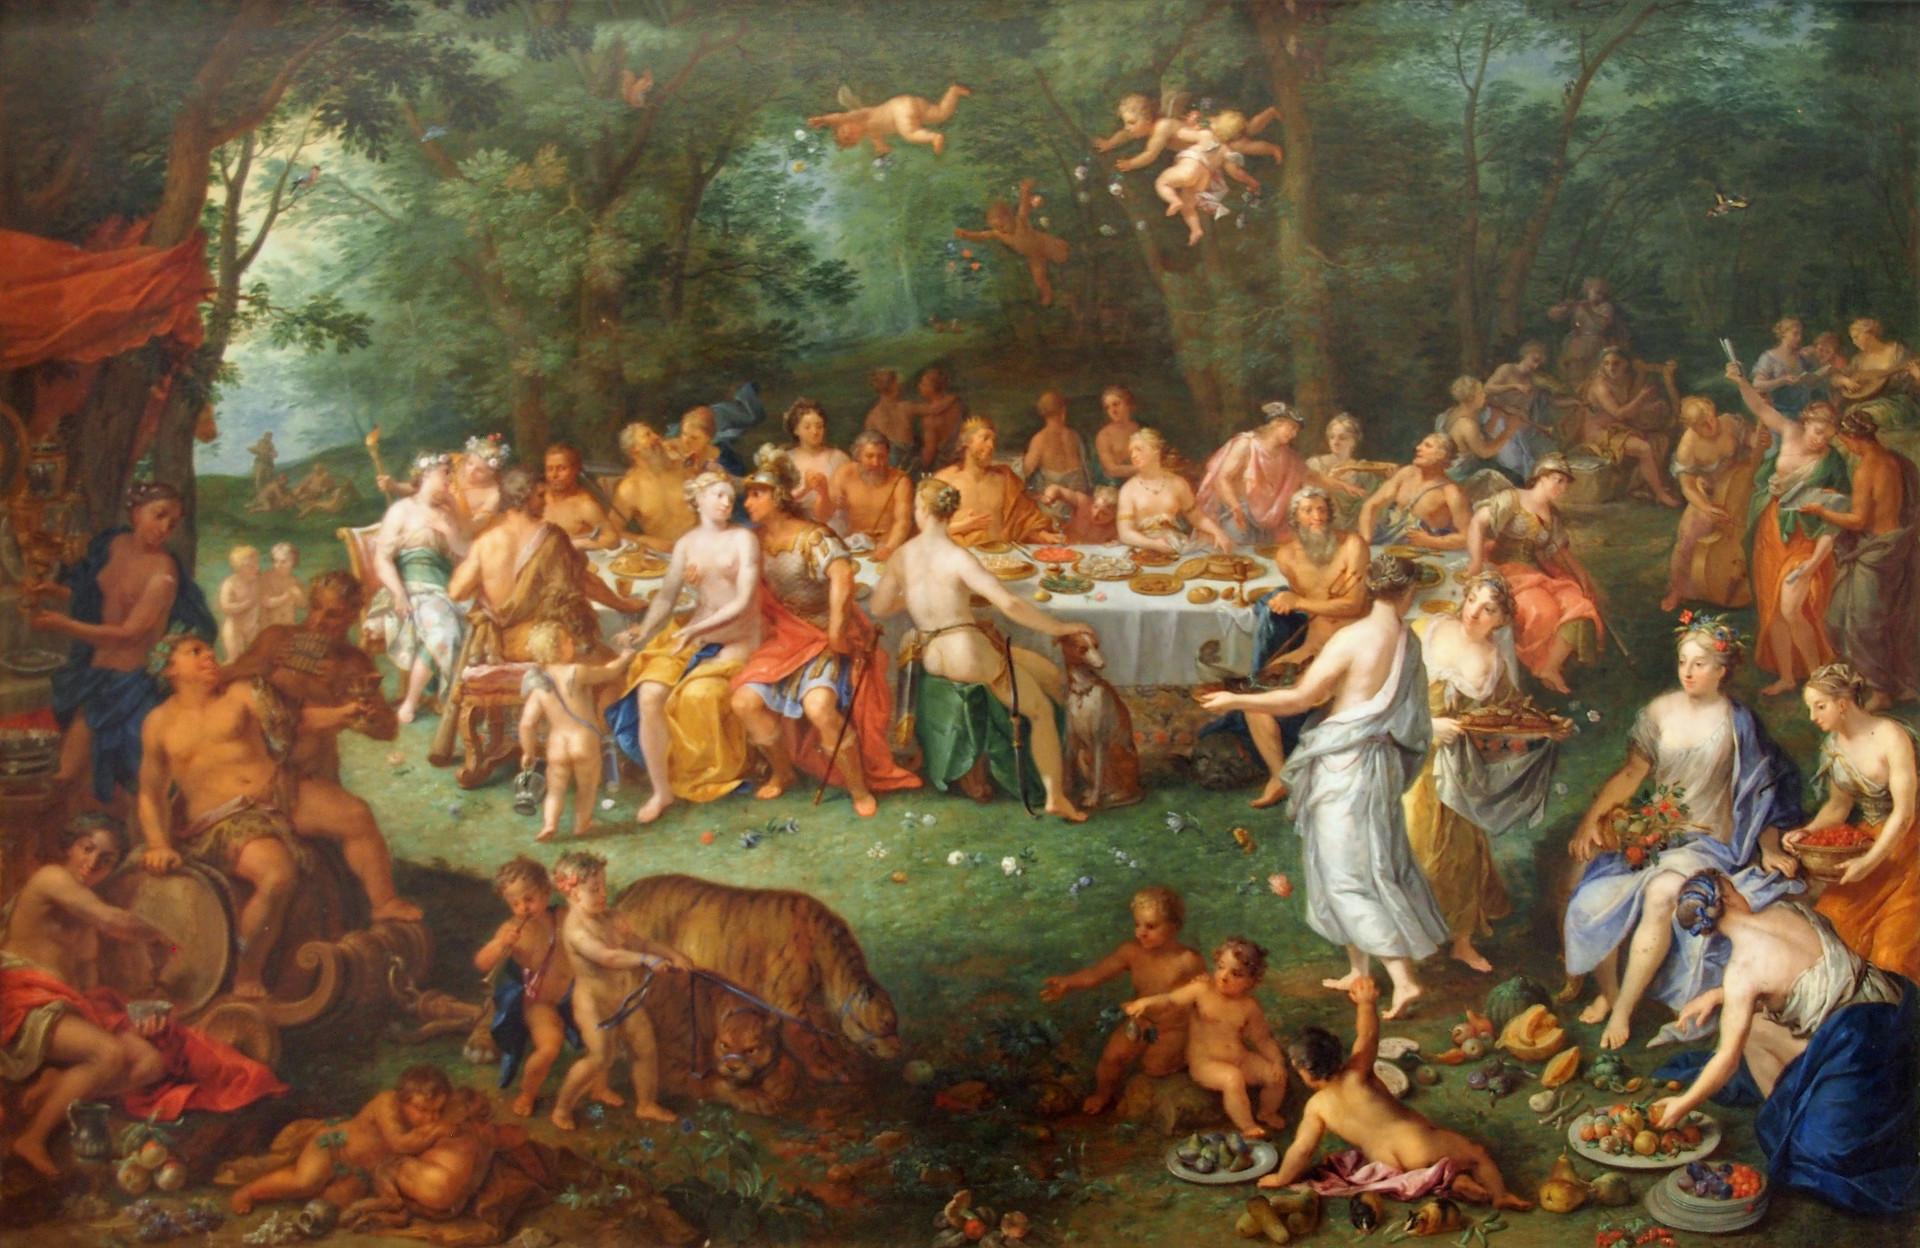 Göttermahl (Feast of the Gods)